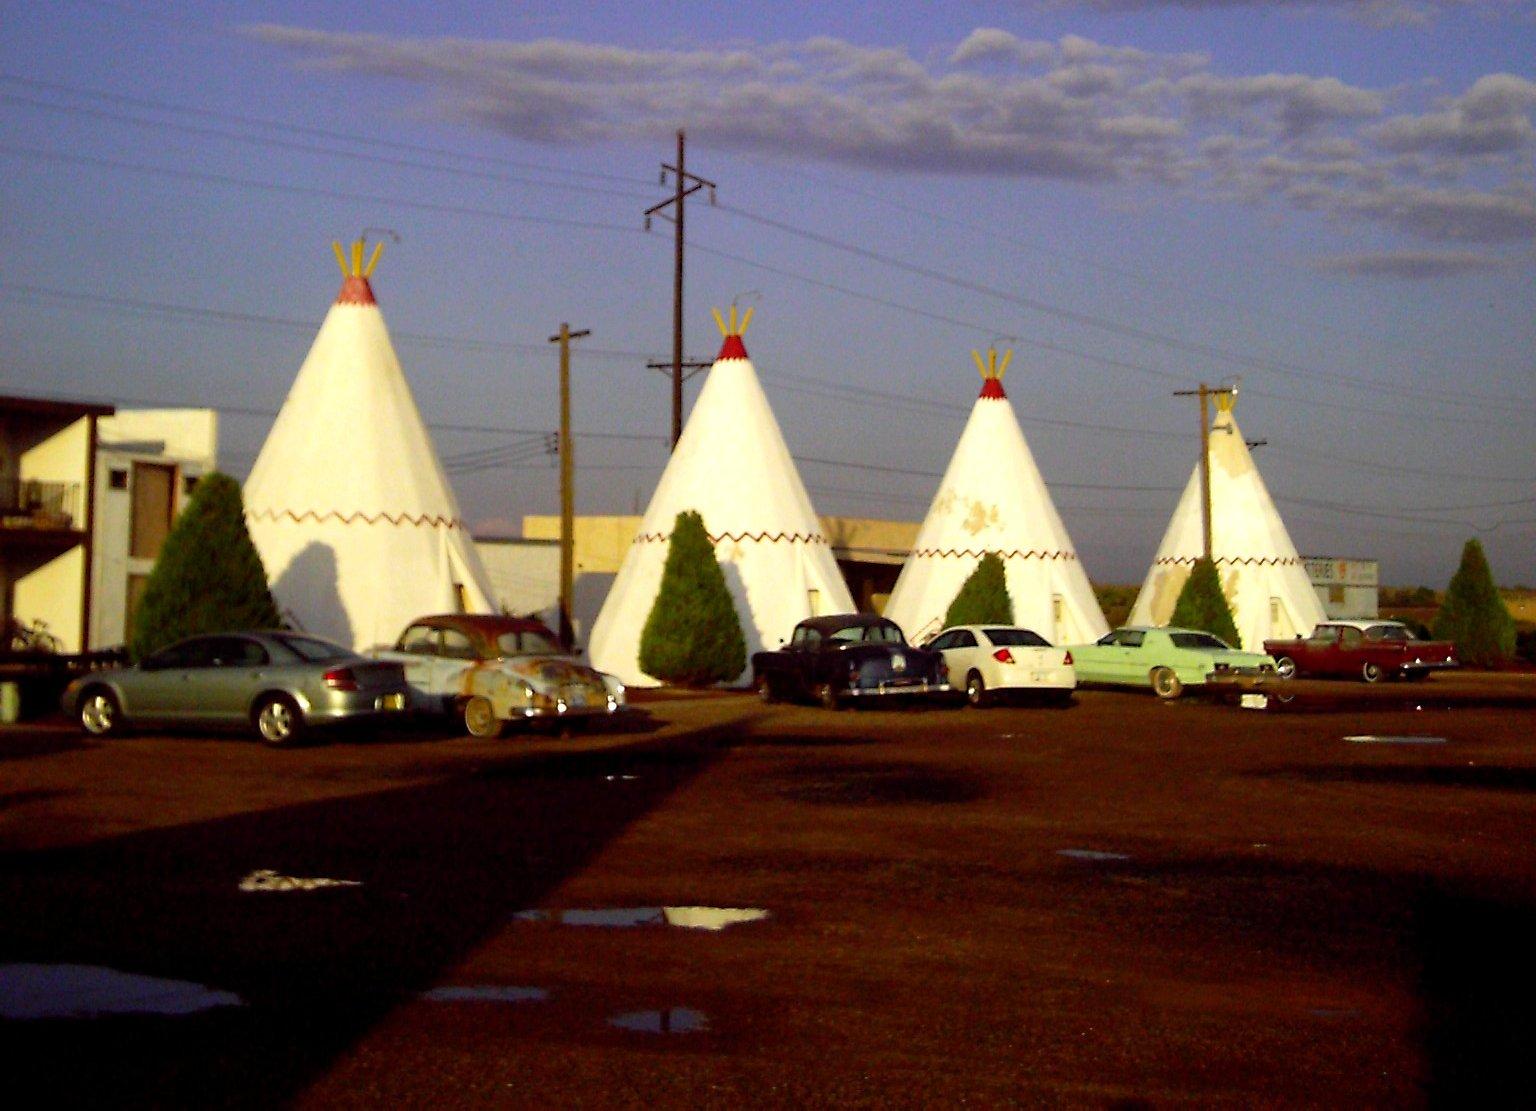 pixar disney cars carisation wigwam motel